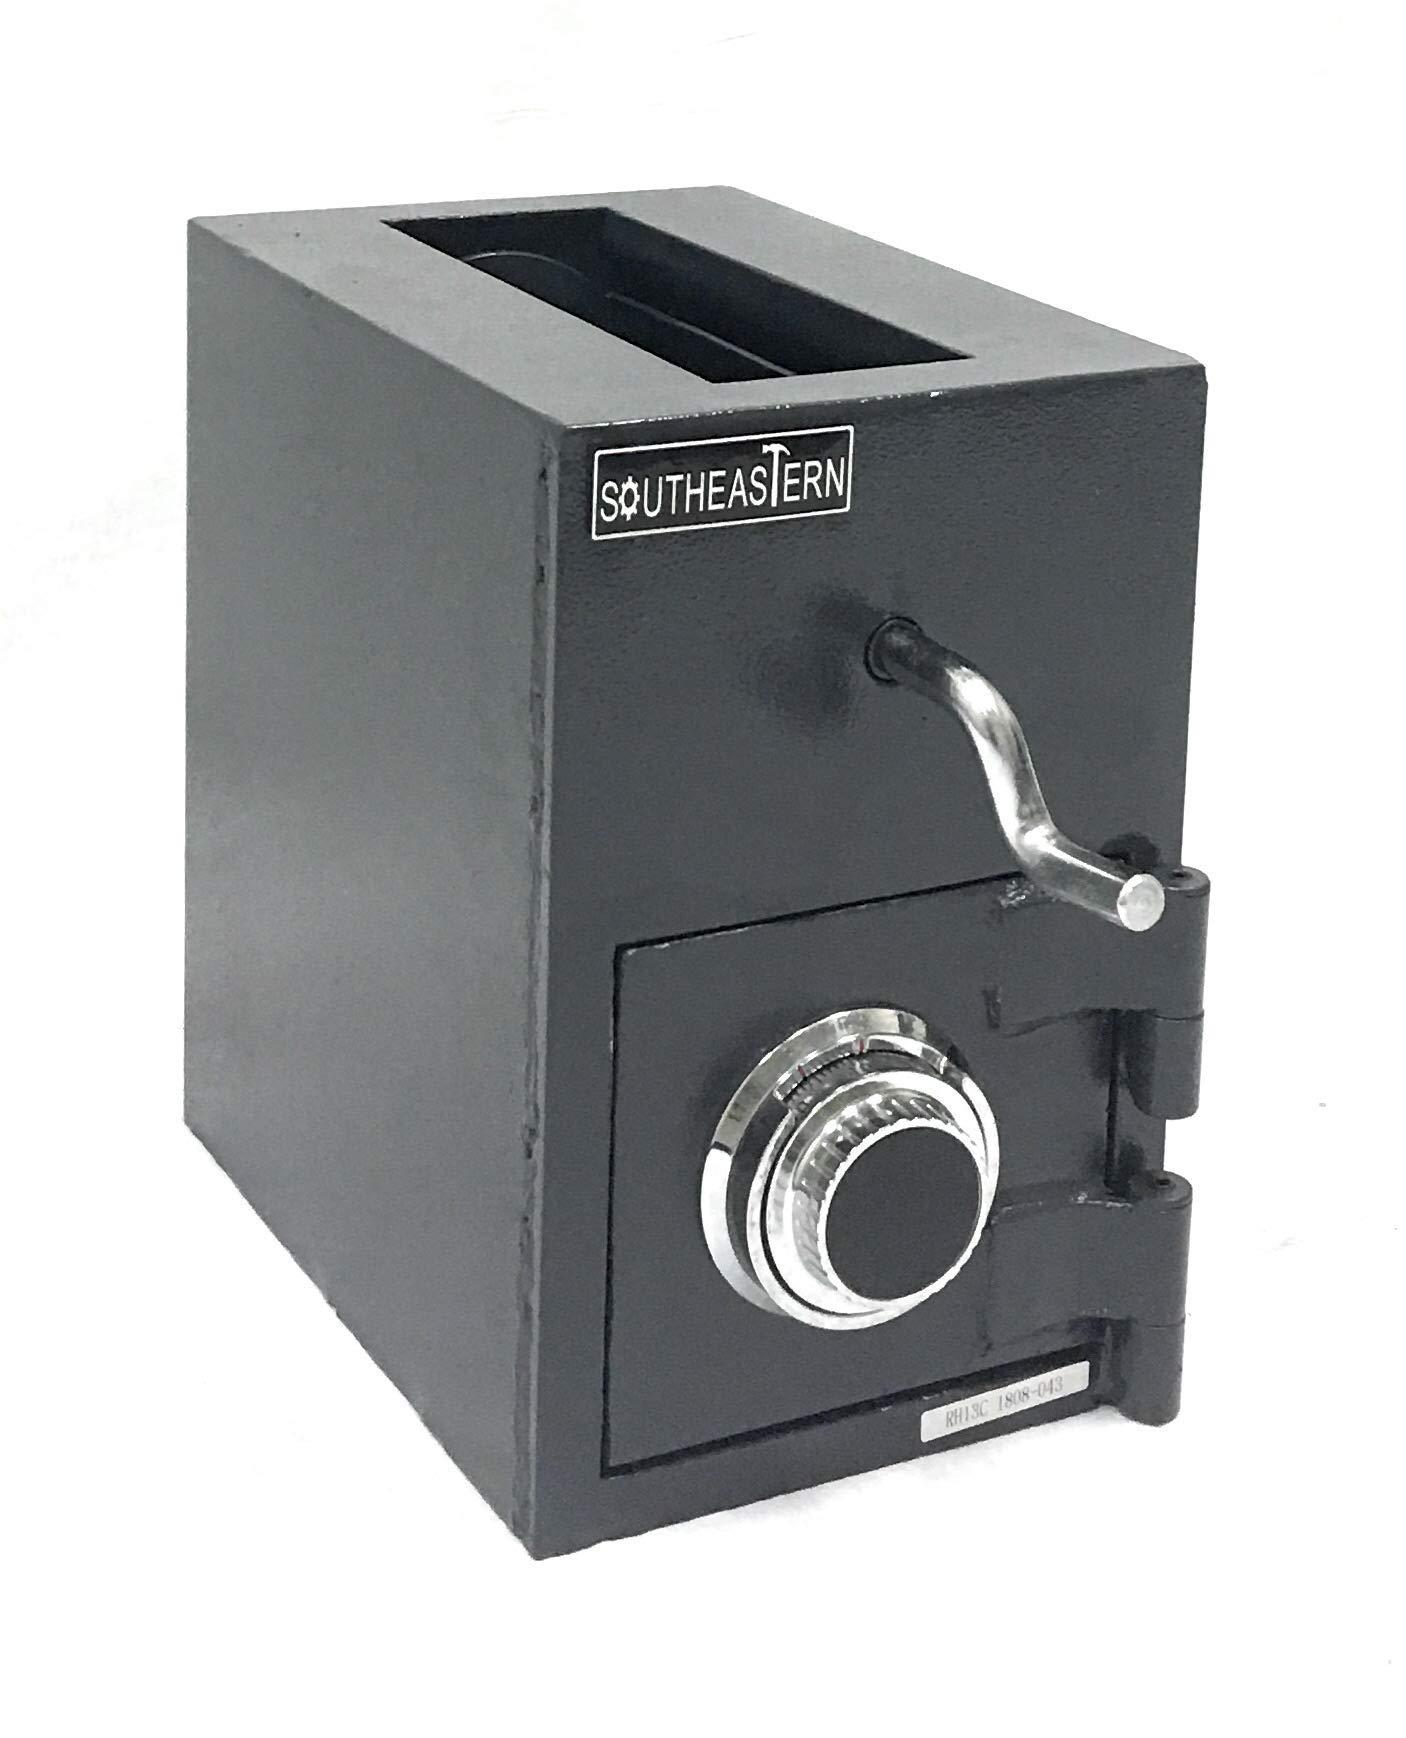 SOUTHEASTERN RH1309C Top Loading Drop Slot Depository Safe w/Dial Combination Lock by Southeastern